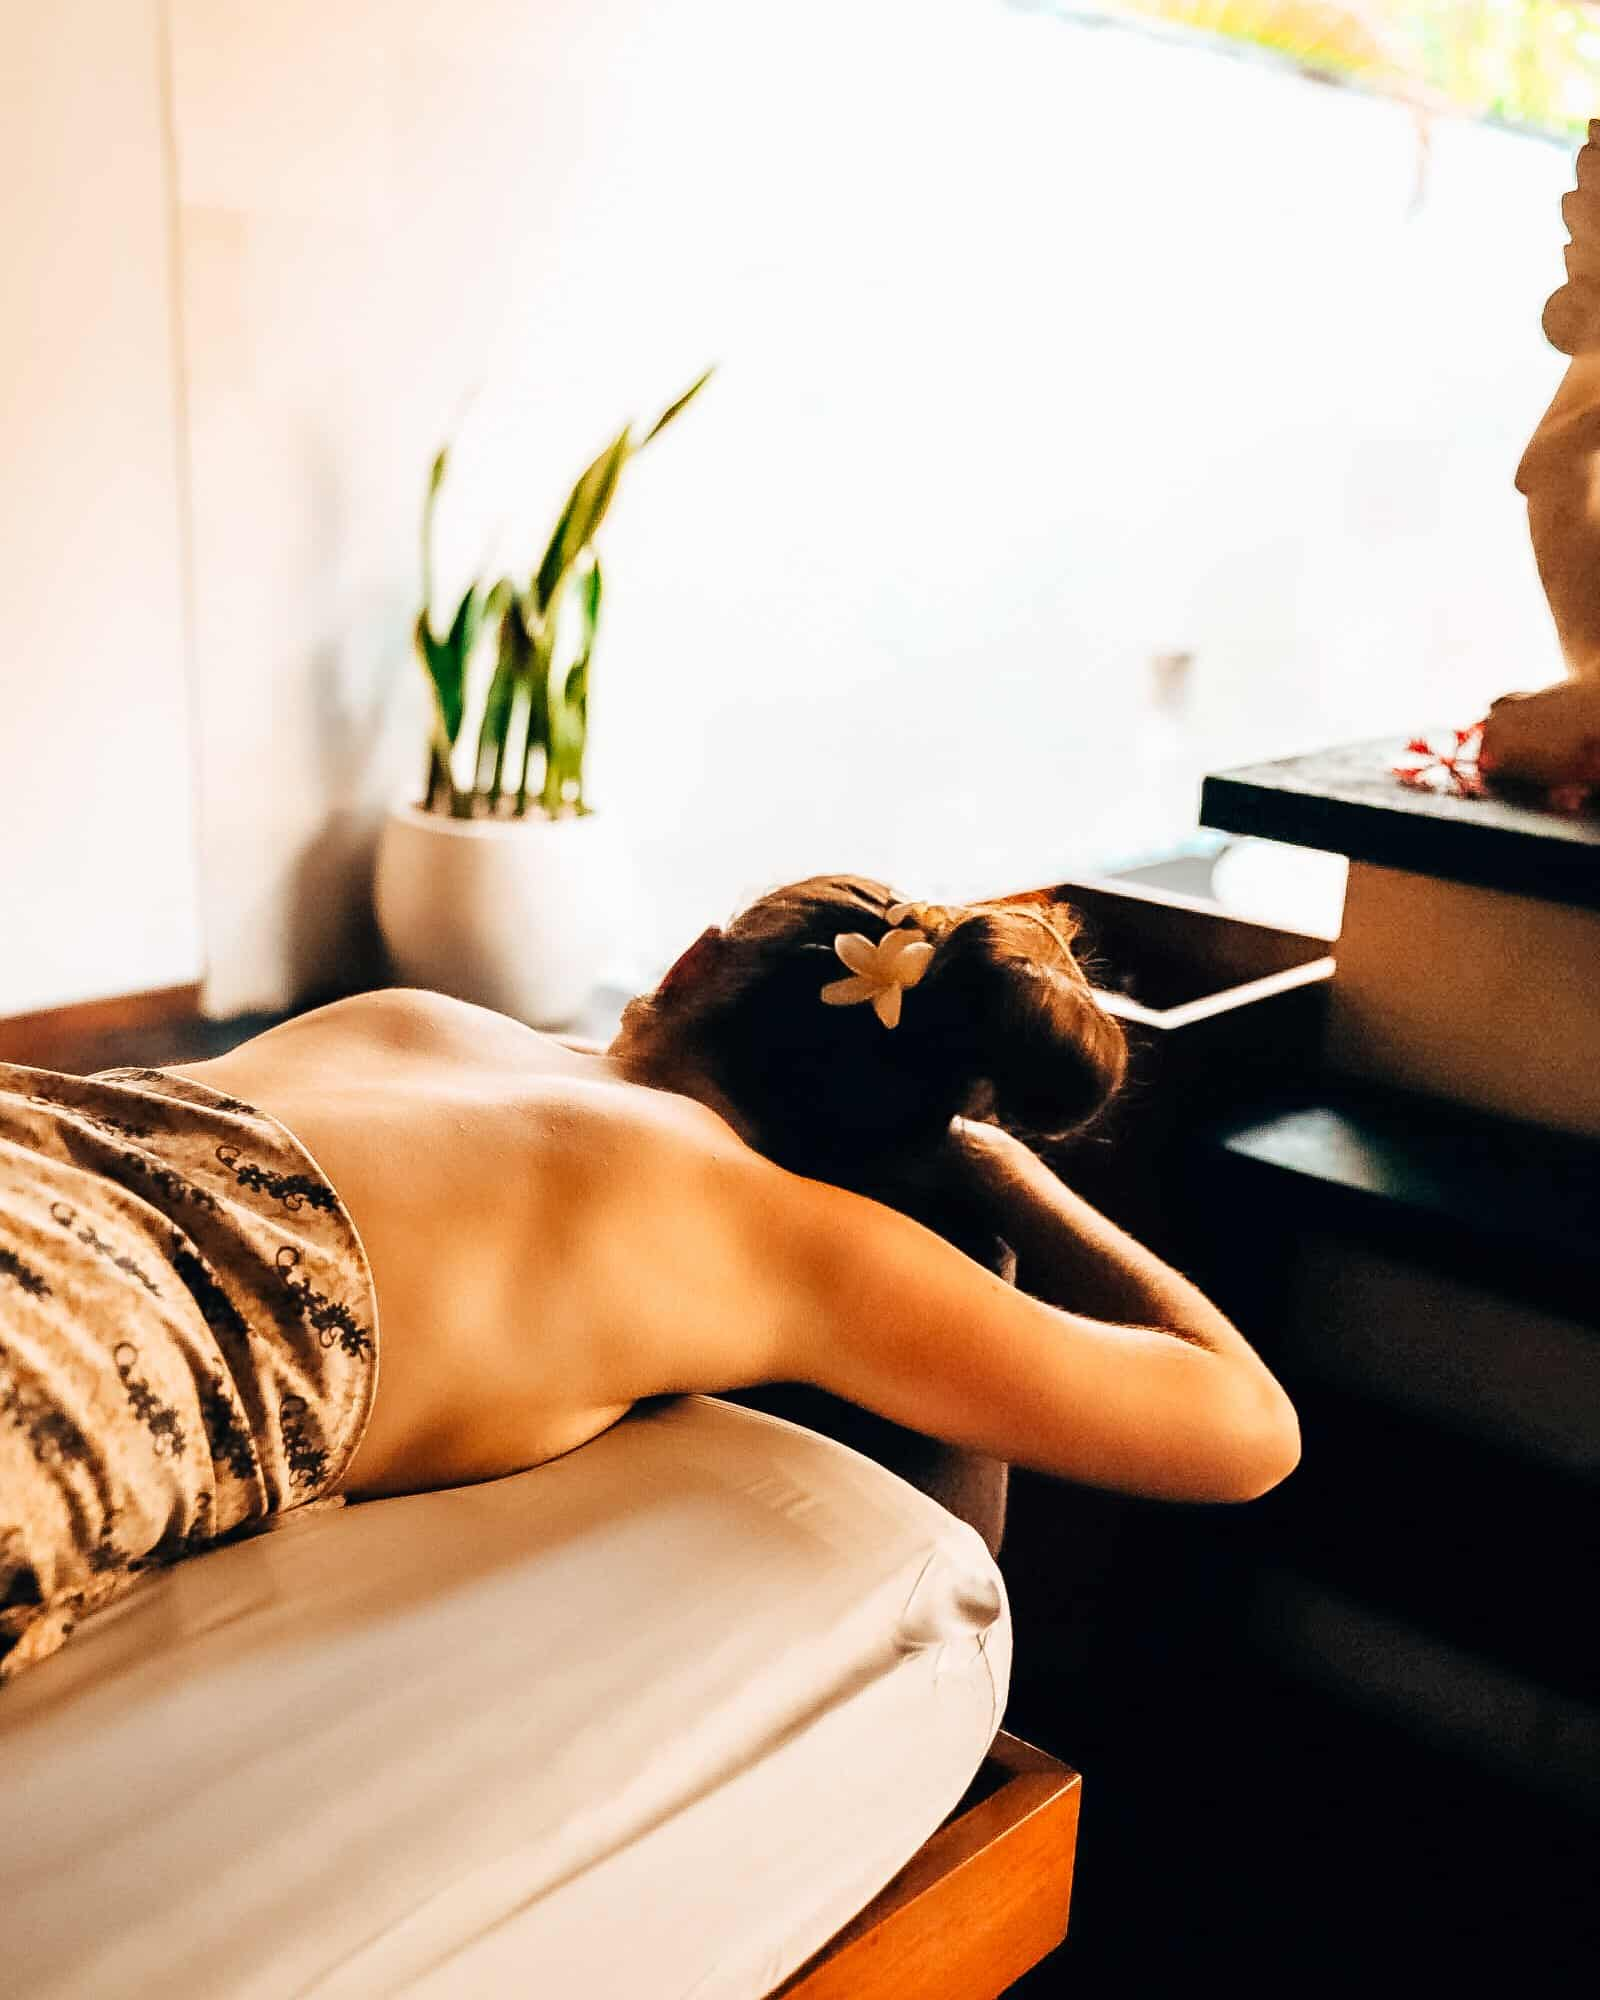 Balinese Massage at Nusa Dua Beach Resort and Spa - The Next Trip